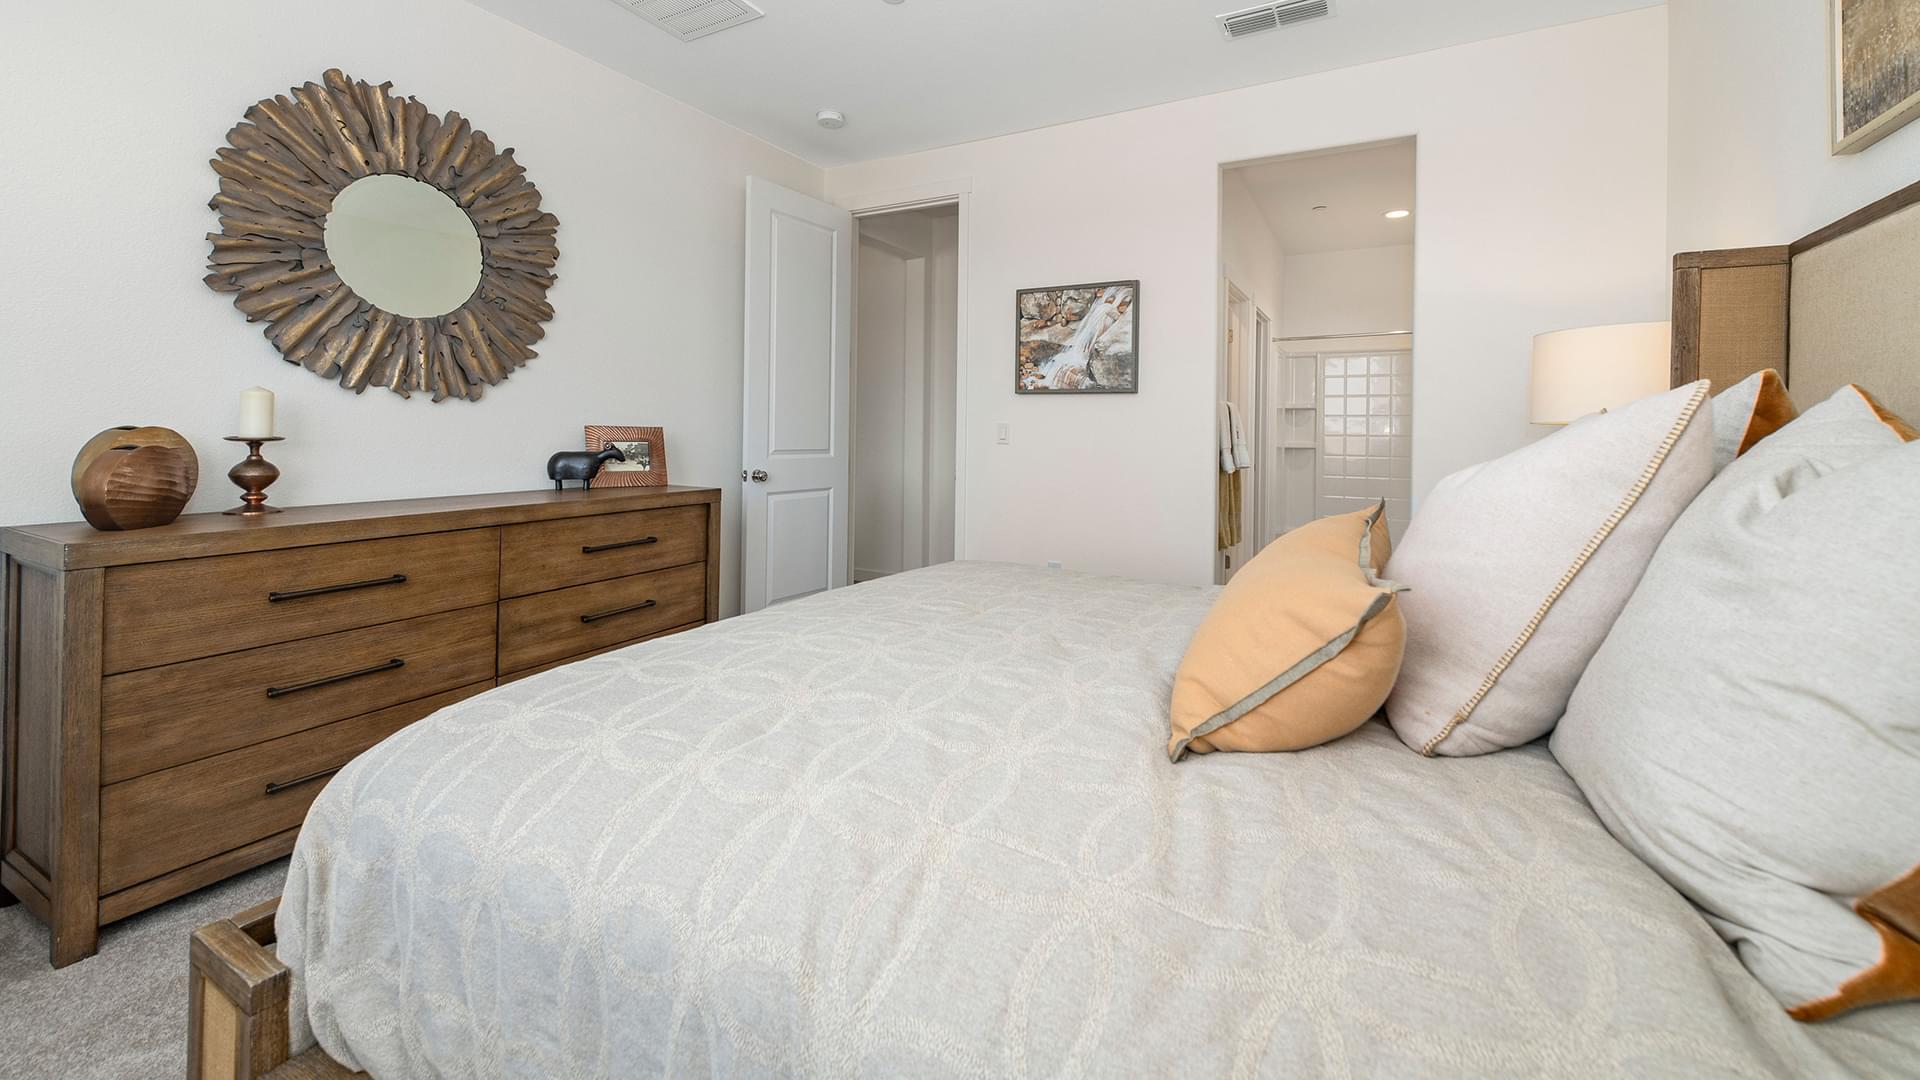 Residence 1 | Lot 166 | Master Bedroom